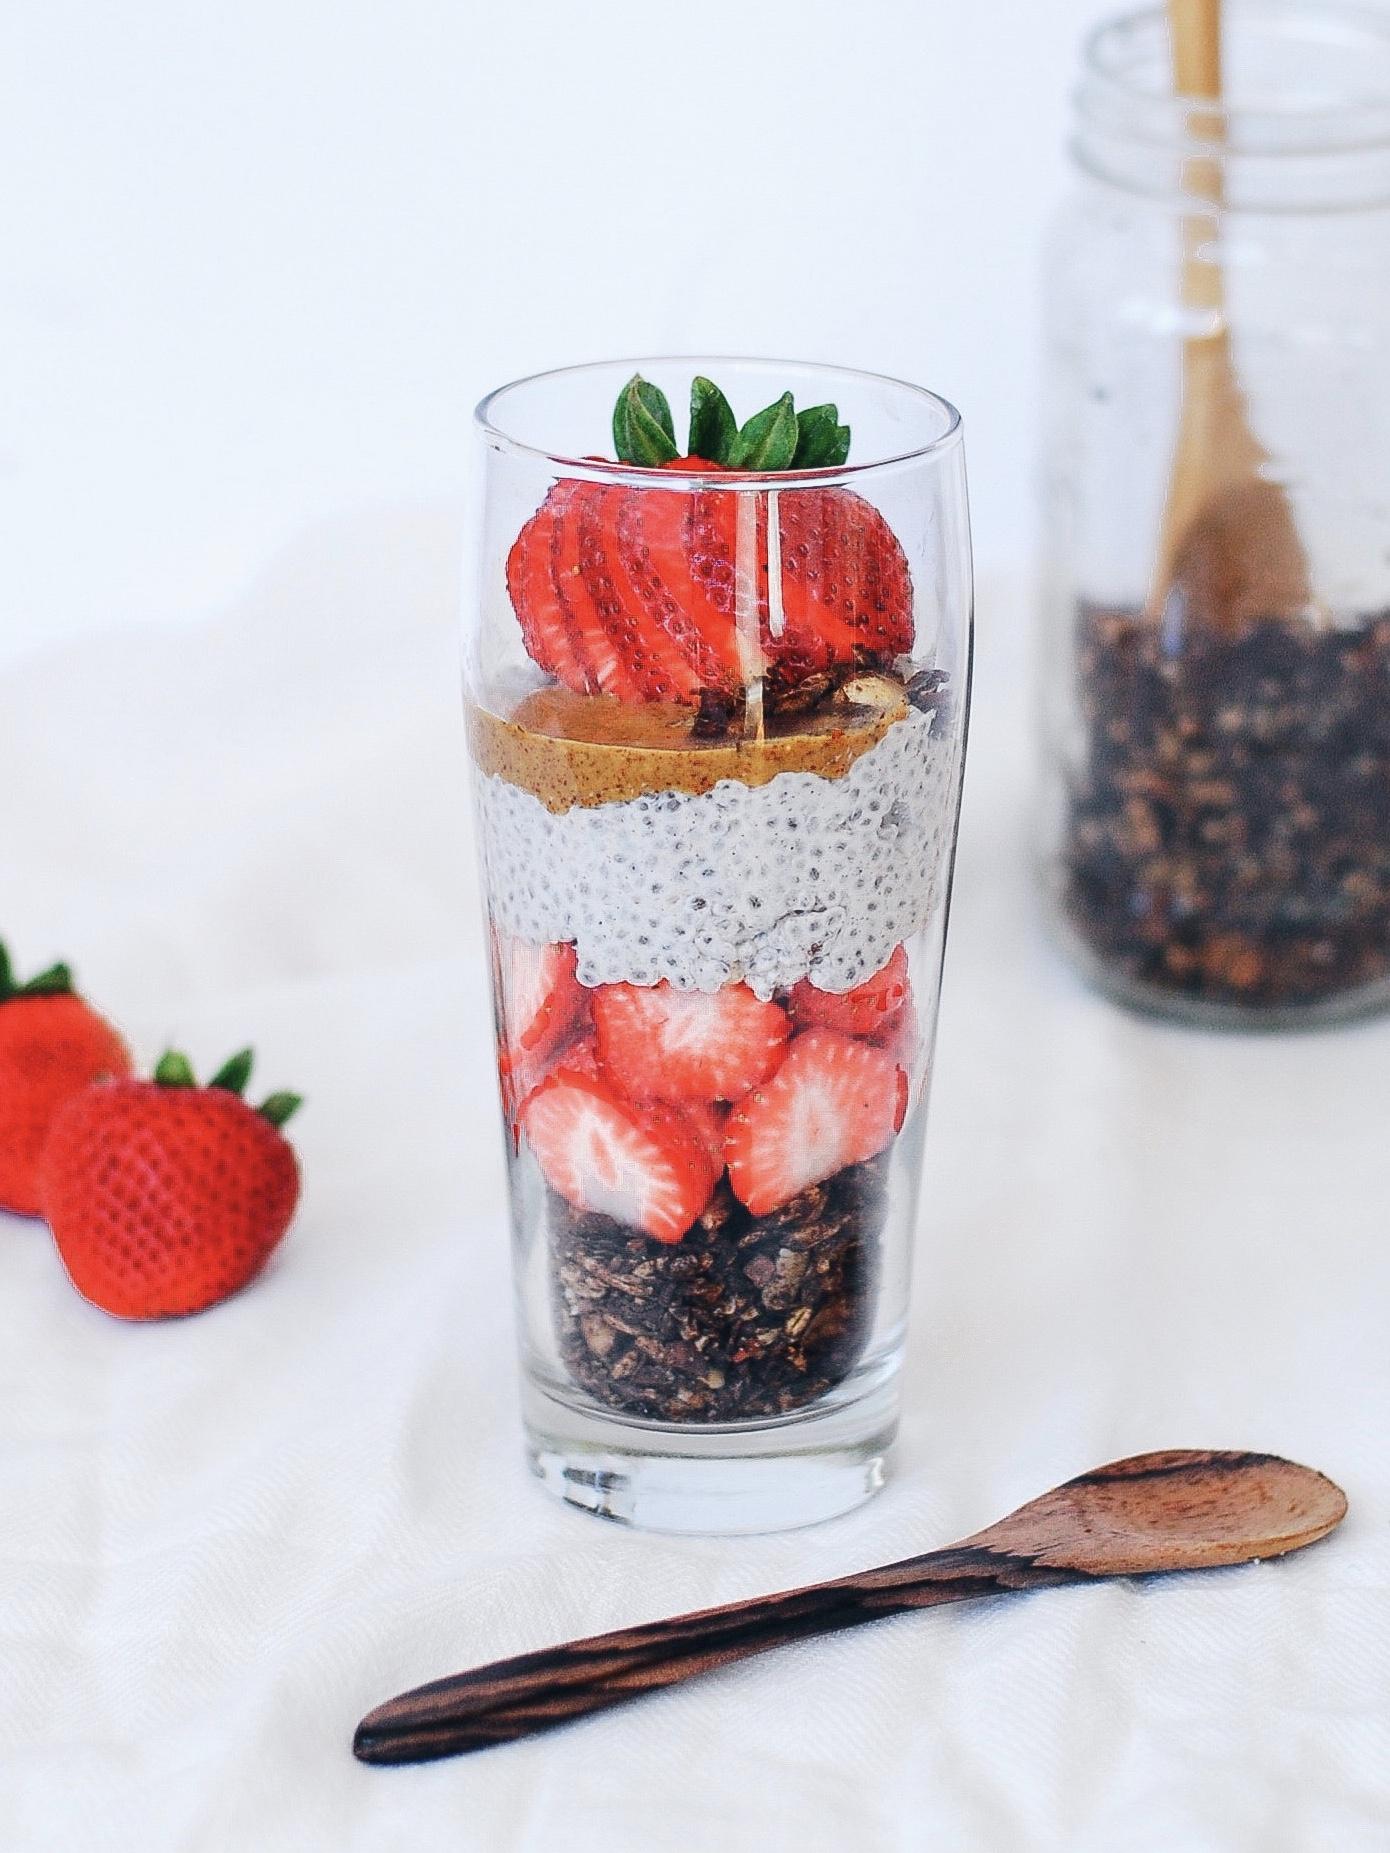 Chocolatey Granola and Strawberry Chia Parfait - Foody First